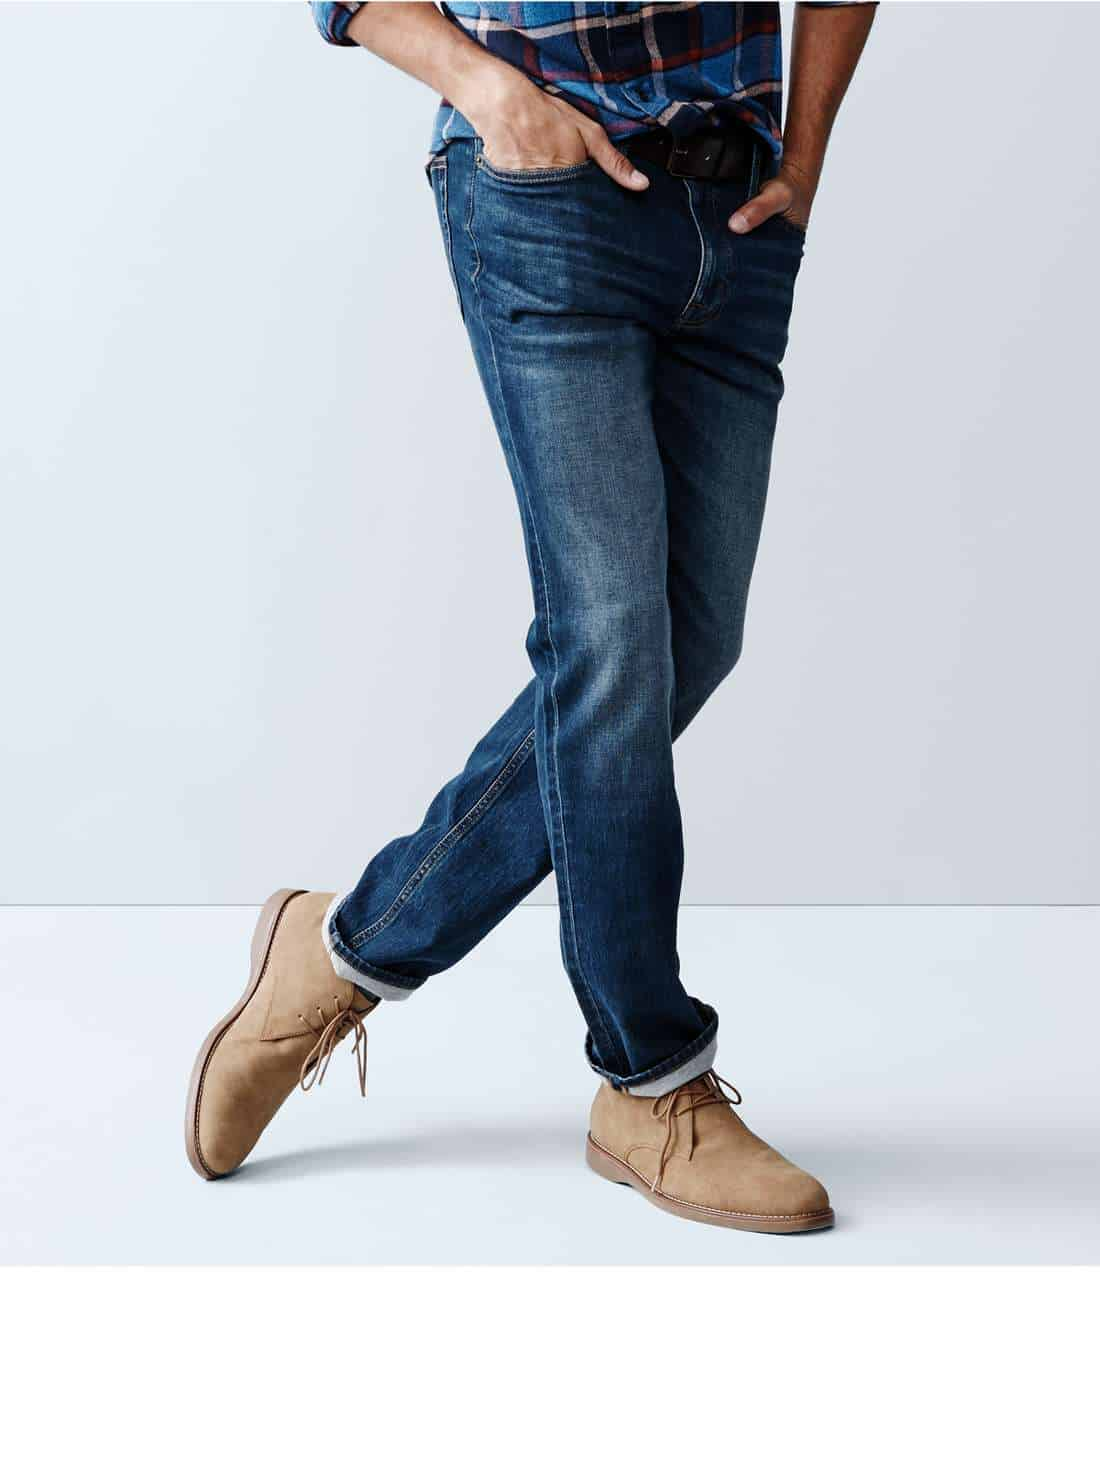 A man wearing medium blue jeans